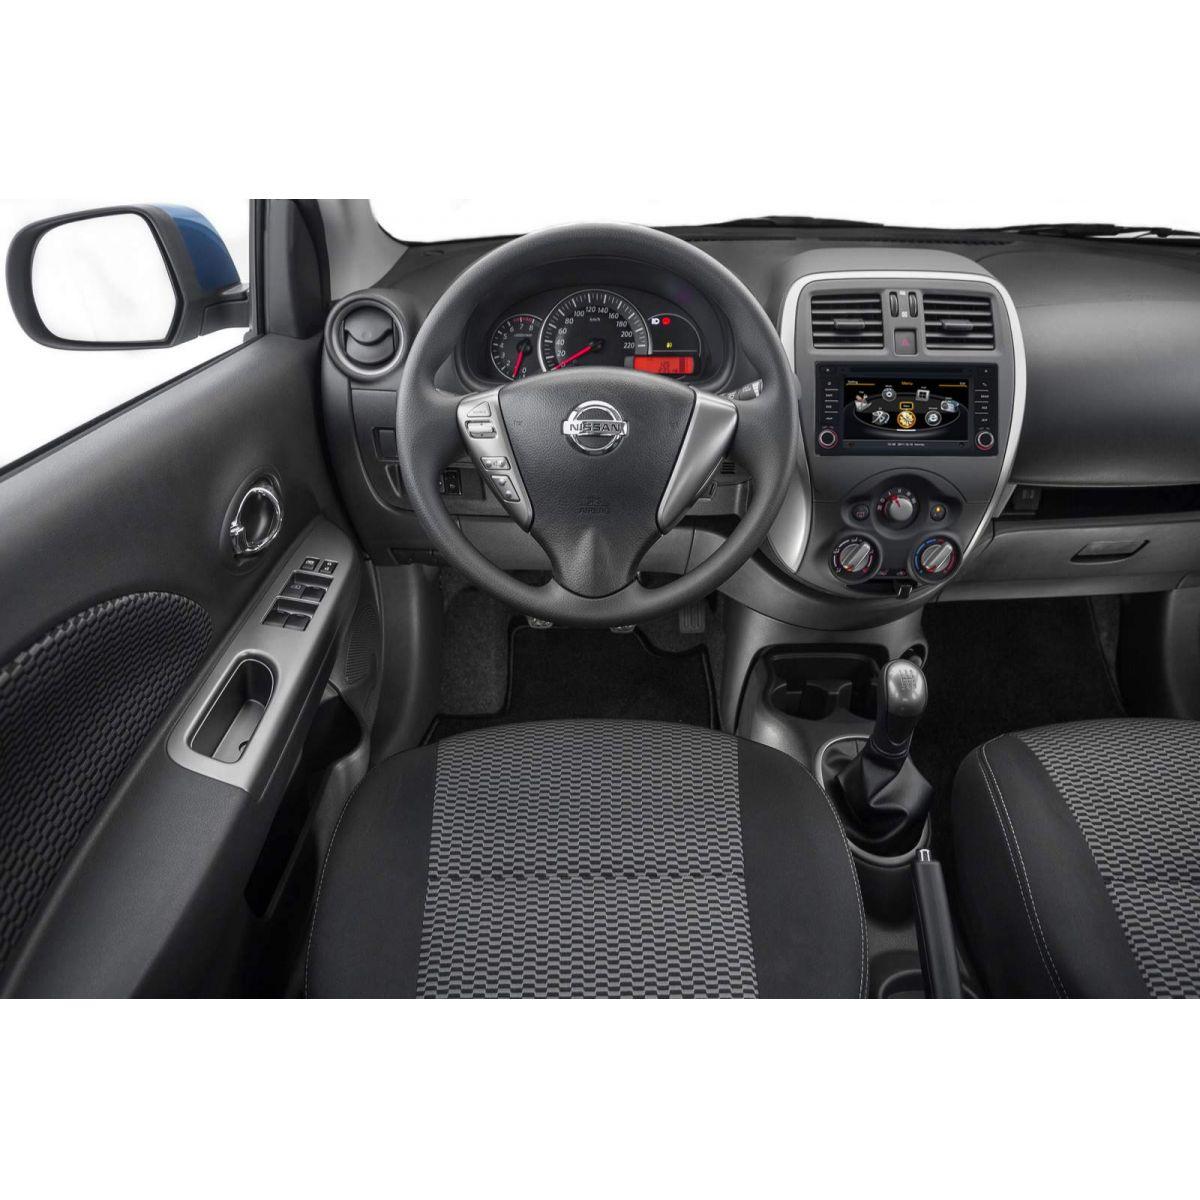 Central Multimidia Nissan March 2014 á 2016   e  Versa 2015 2016 2017  Com DVD GPS Mapa Bluetooth MP3 USB Ipod SD Card Câmera Ré Grátis - Preta - Winca